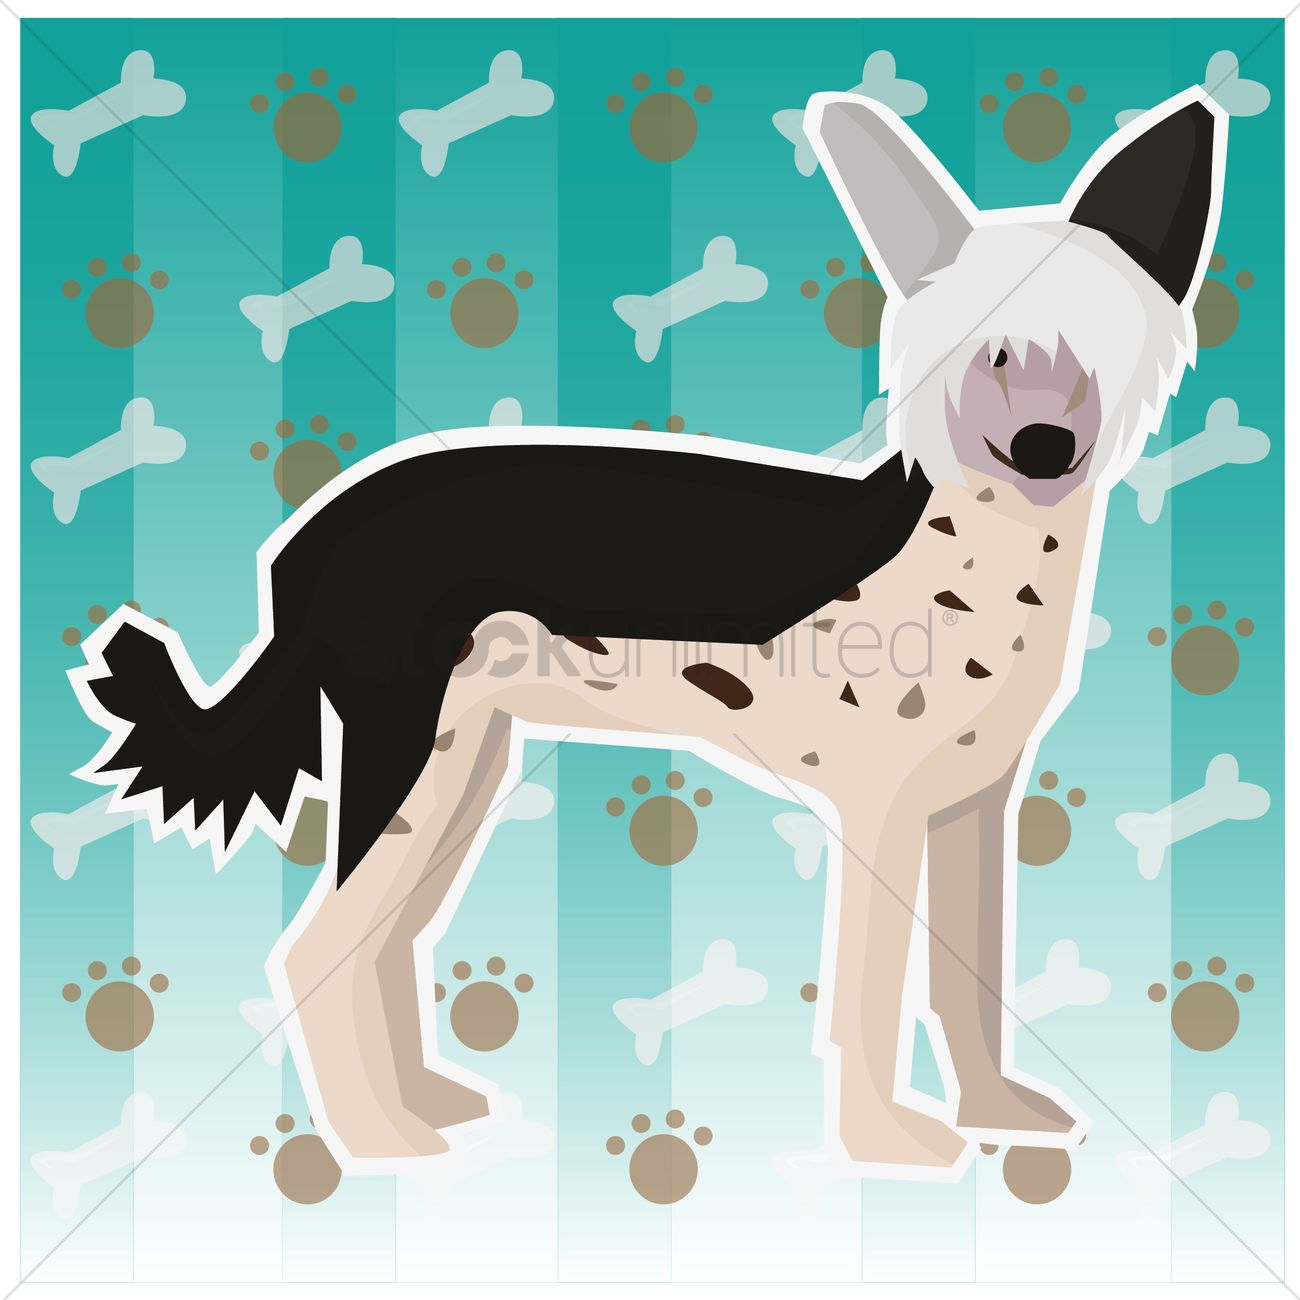 Free Bedlington terrier dog Vector Image.